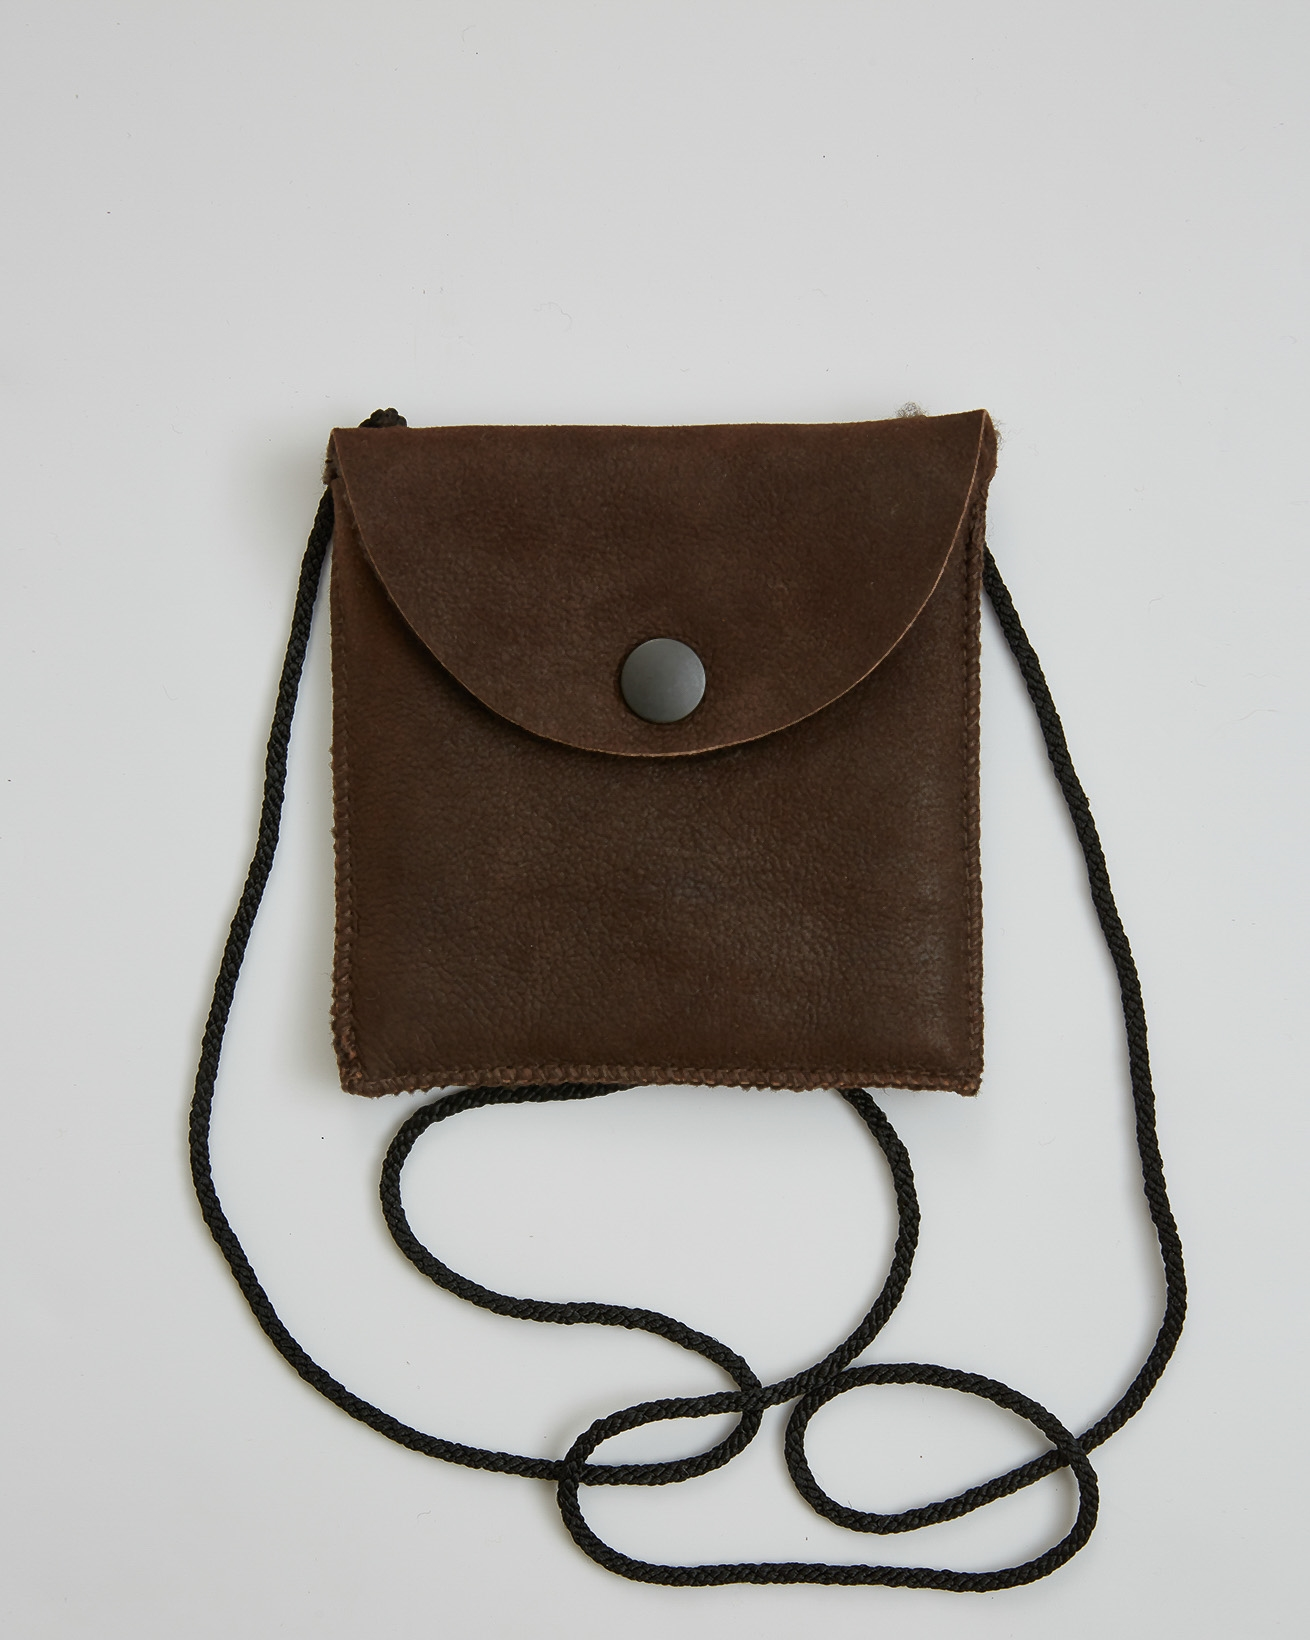 Sheepskin Purse - Brown - One Size - 2774